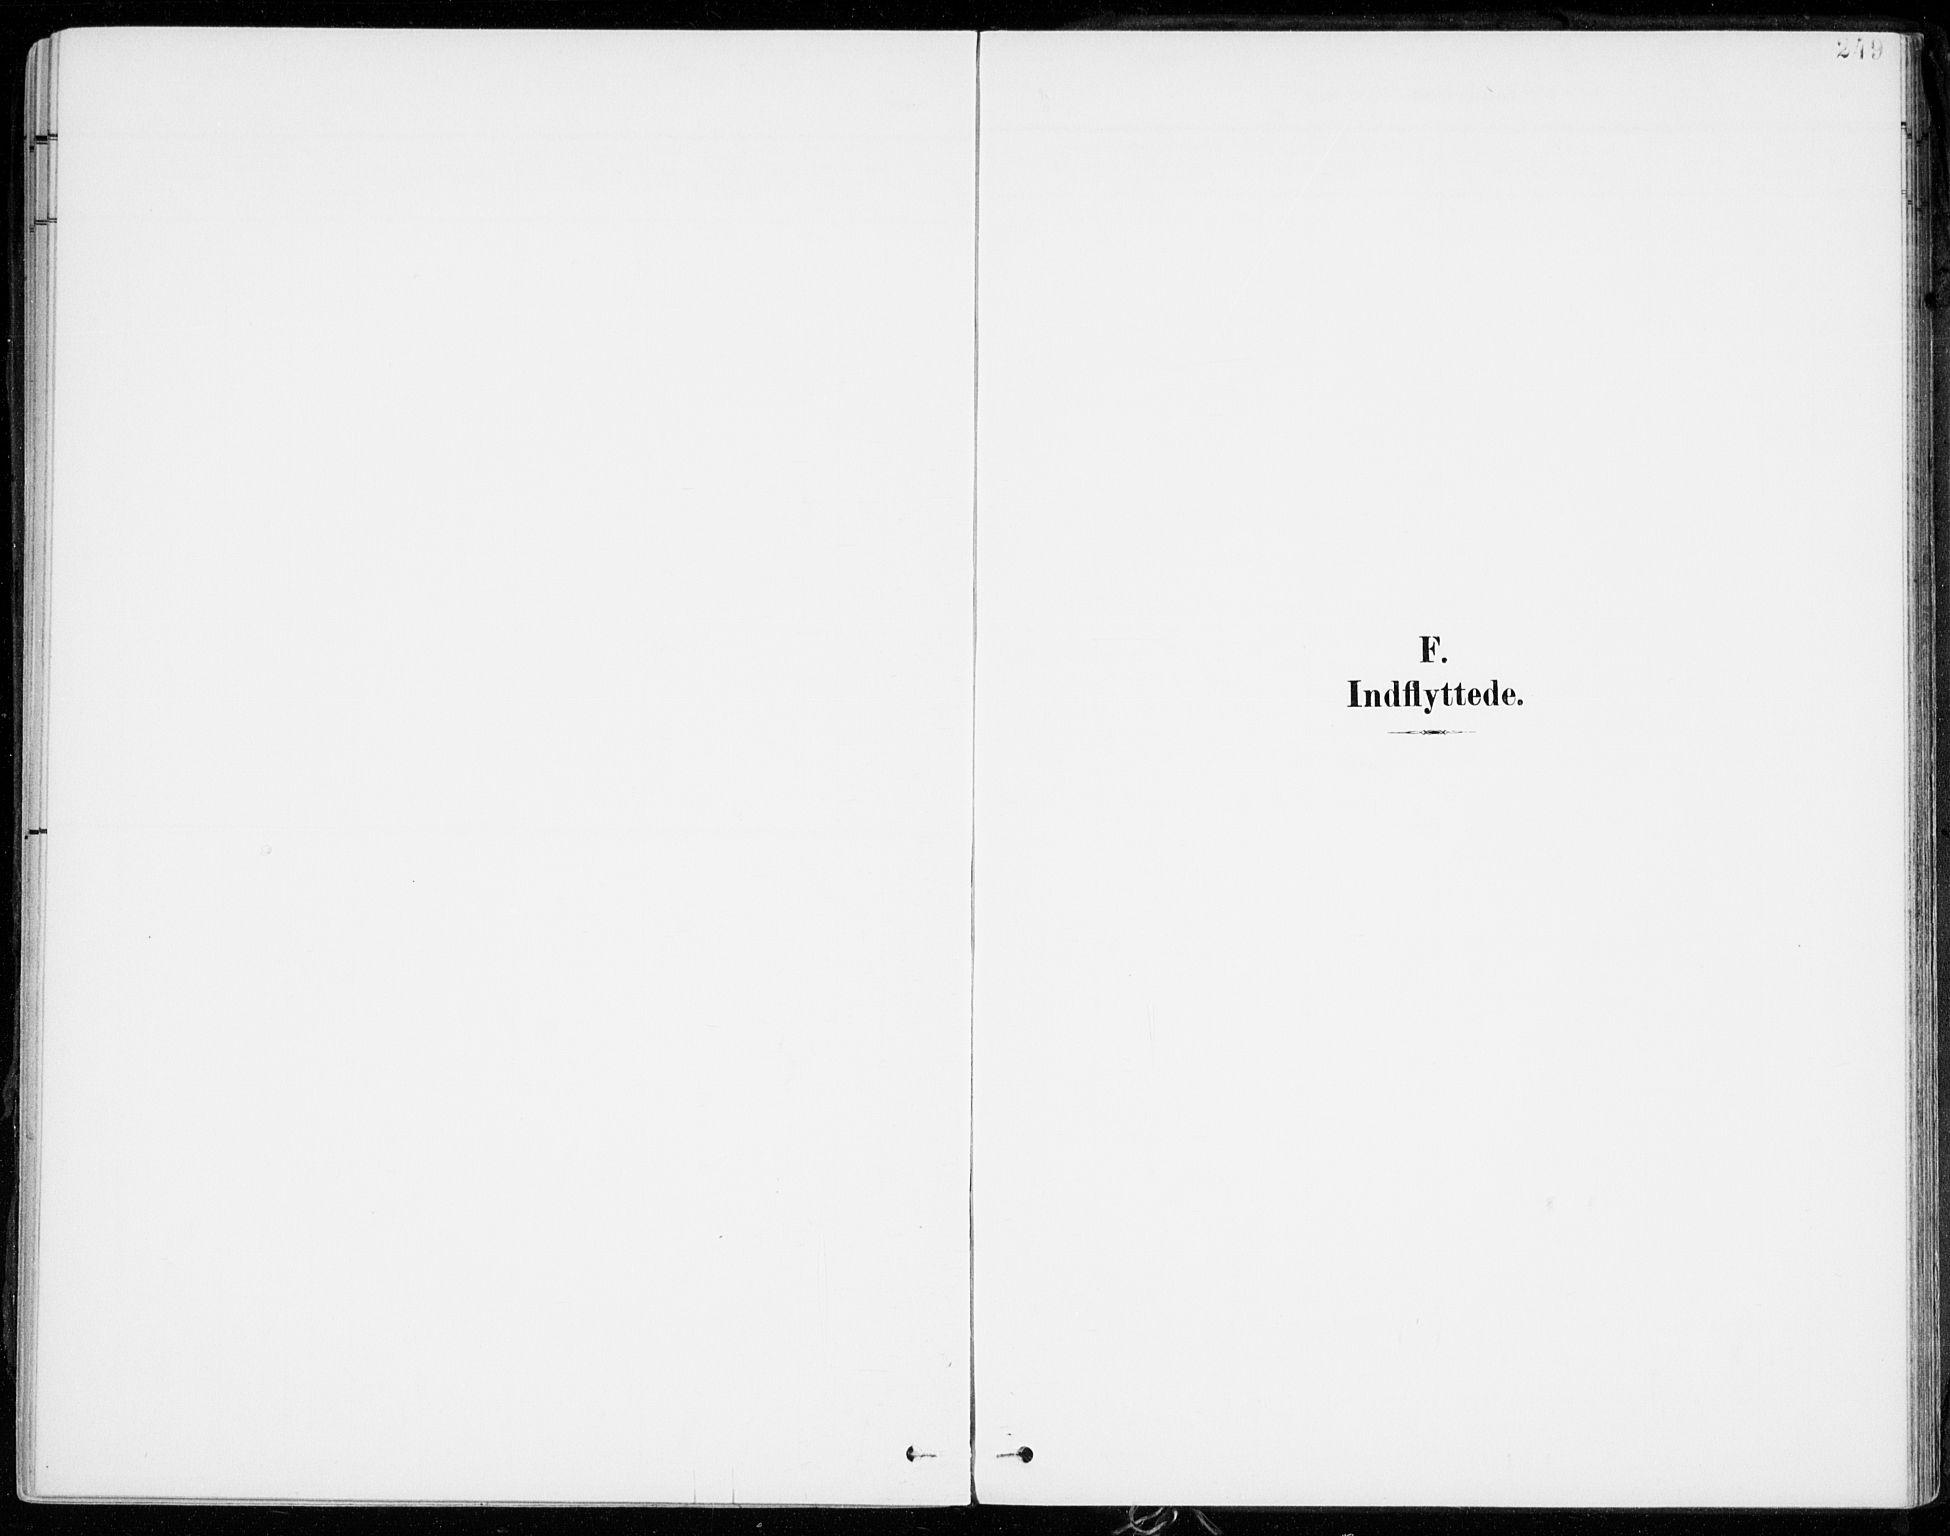 SATØ, Lenvik sokneprestembete, H/Ha: Ministerialbok nr. 14, 1899-1909, s. 249